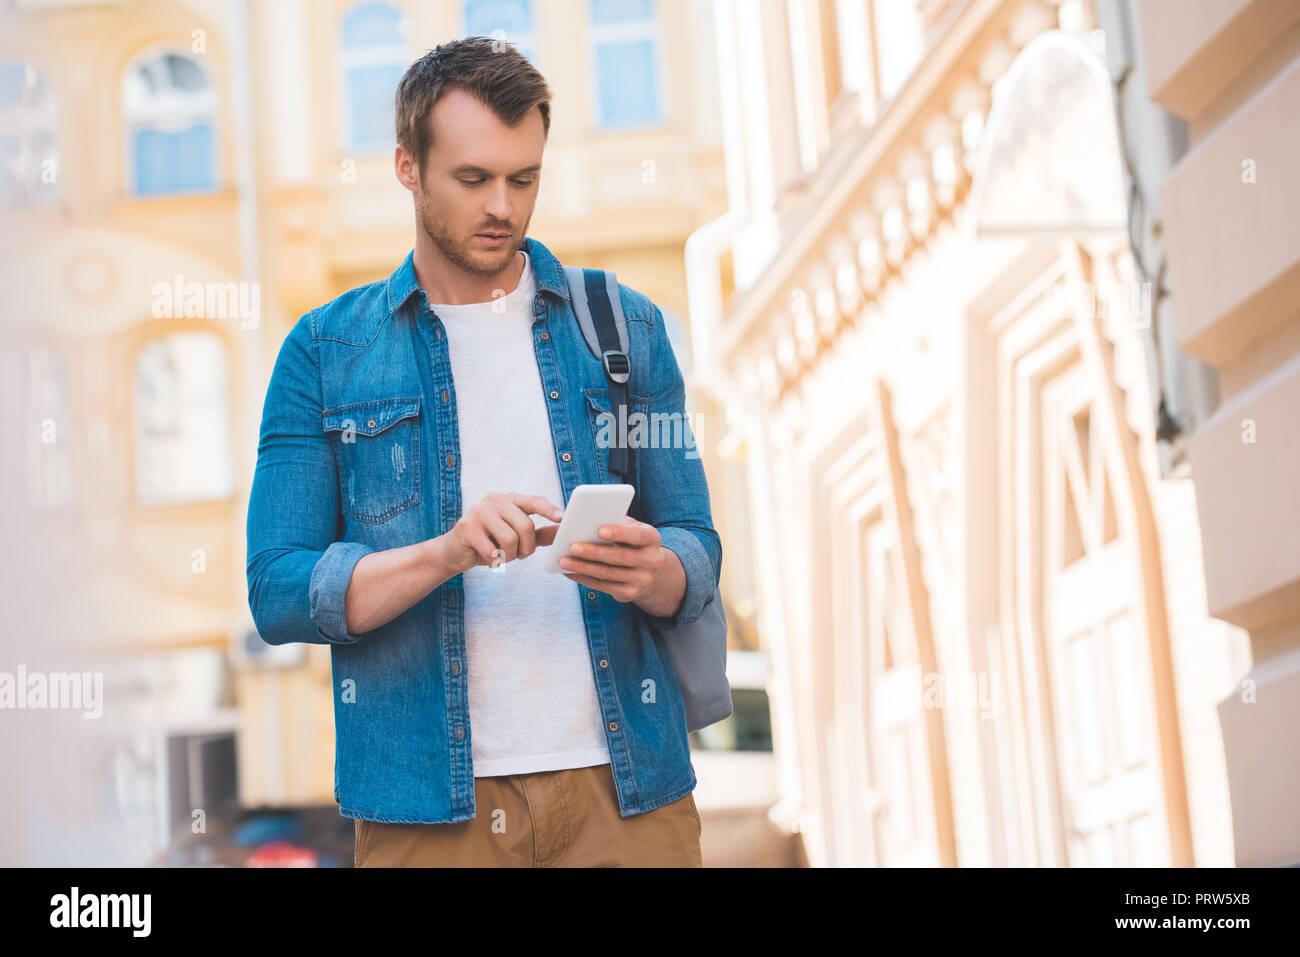 portrait of focused man in denim shirt using smartphone on street - Stock Image